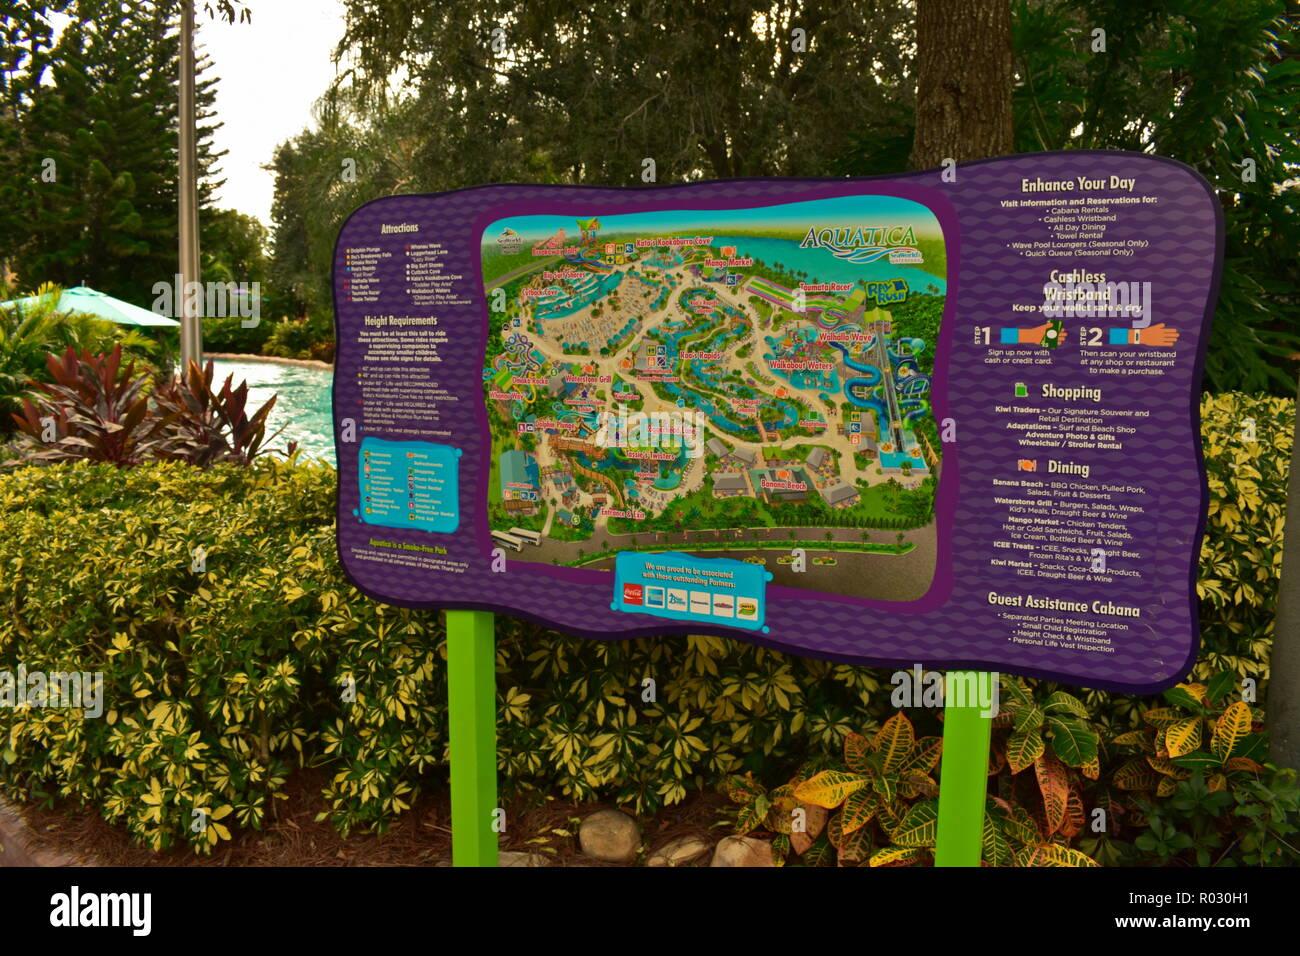 Disney Parks Map on